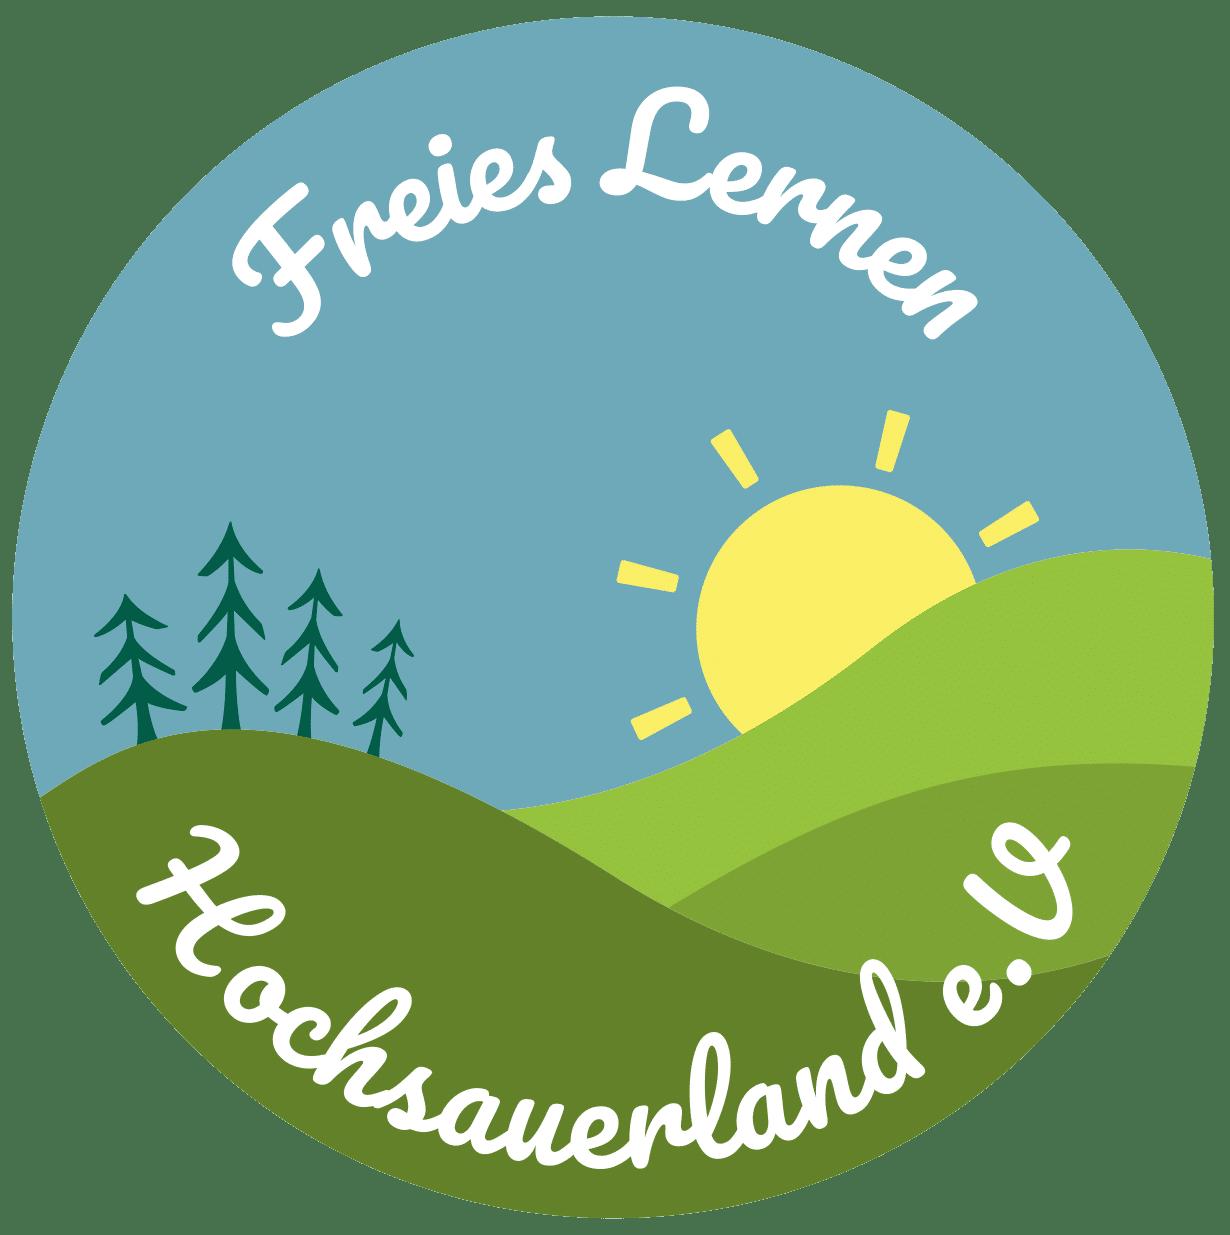 Freies Lernen Hochsauerland e.V.